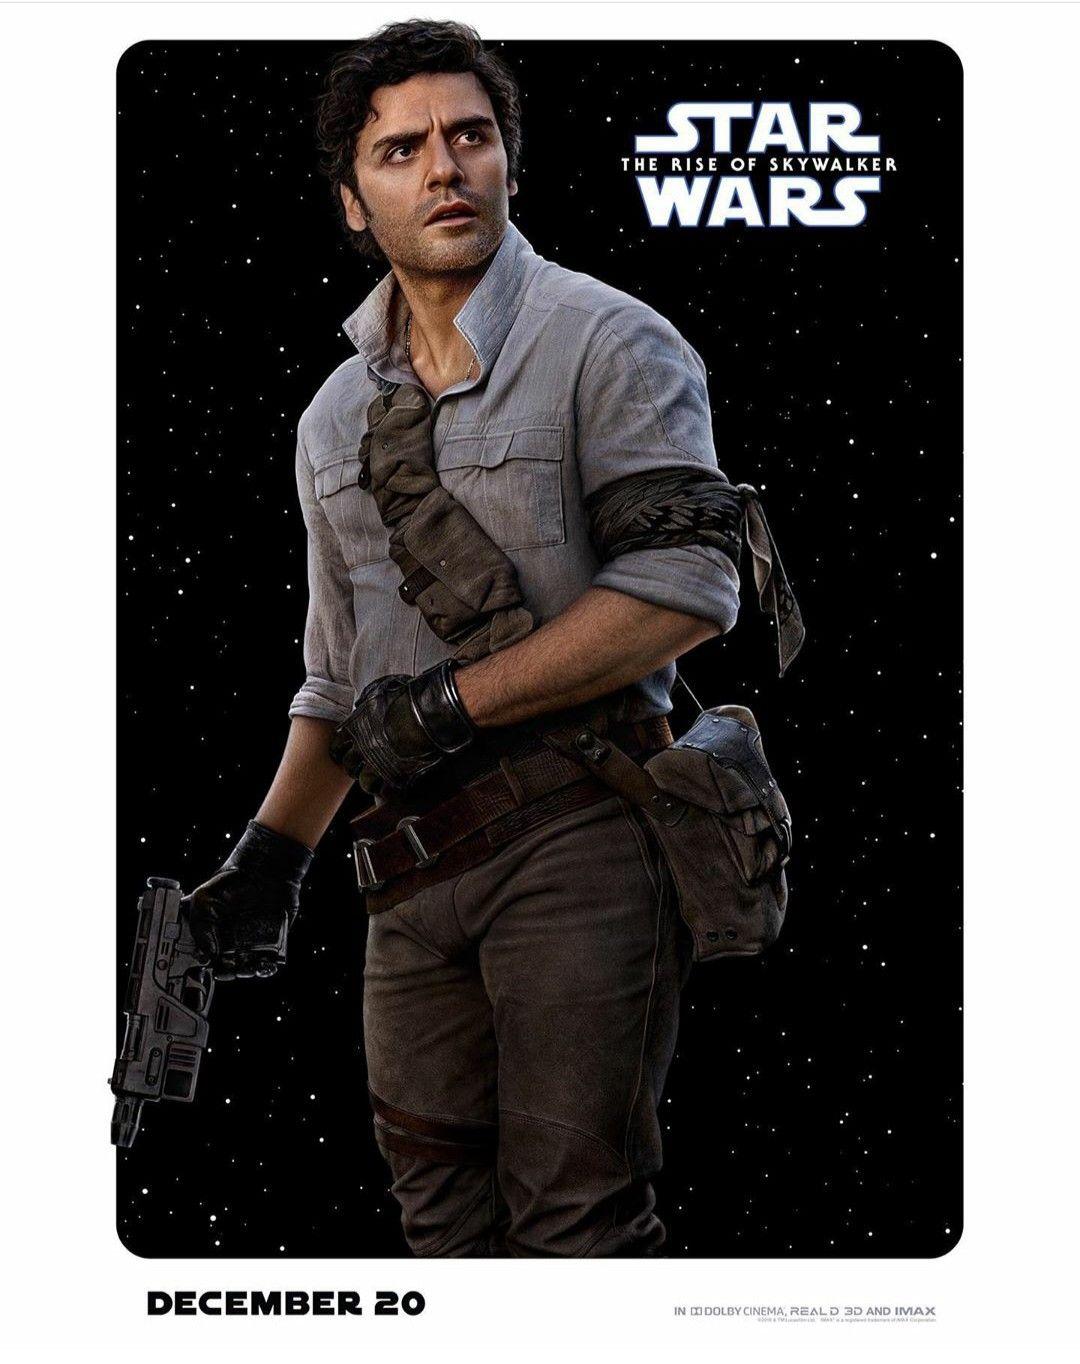 Pin By Disney Lovers On Star Wars In 2020 War Stars Star Wars